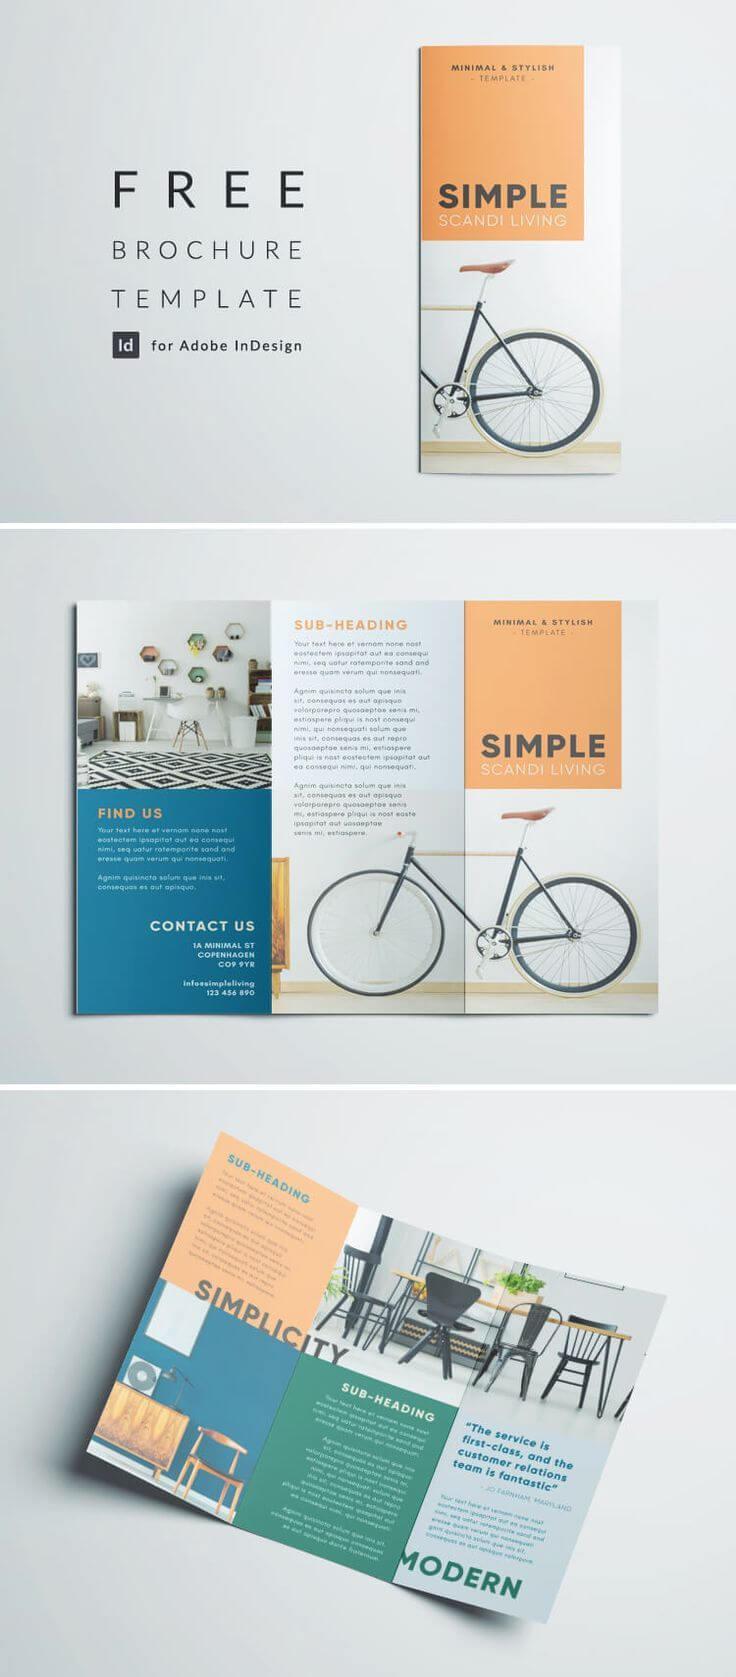 Simple Tri Fold Brochure | Design Inspiration | Indesign With Tri Fold Brochure Template Indesign Free Download